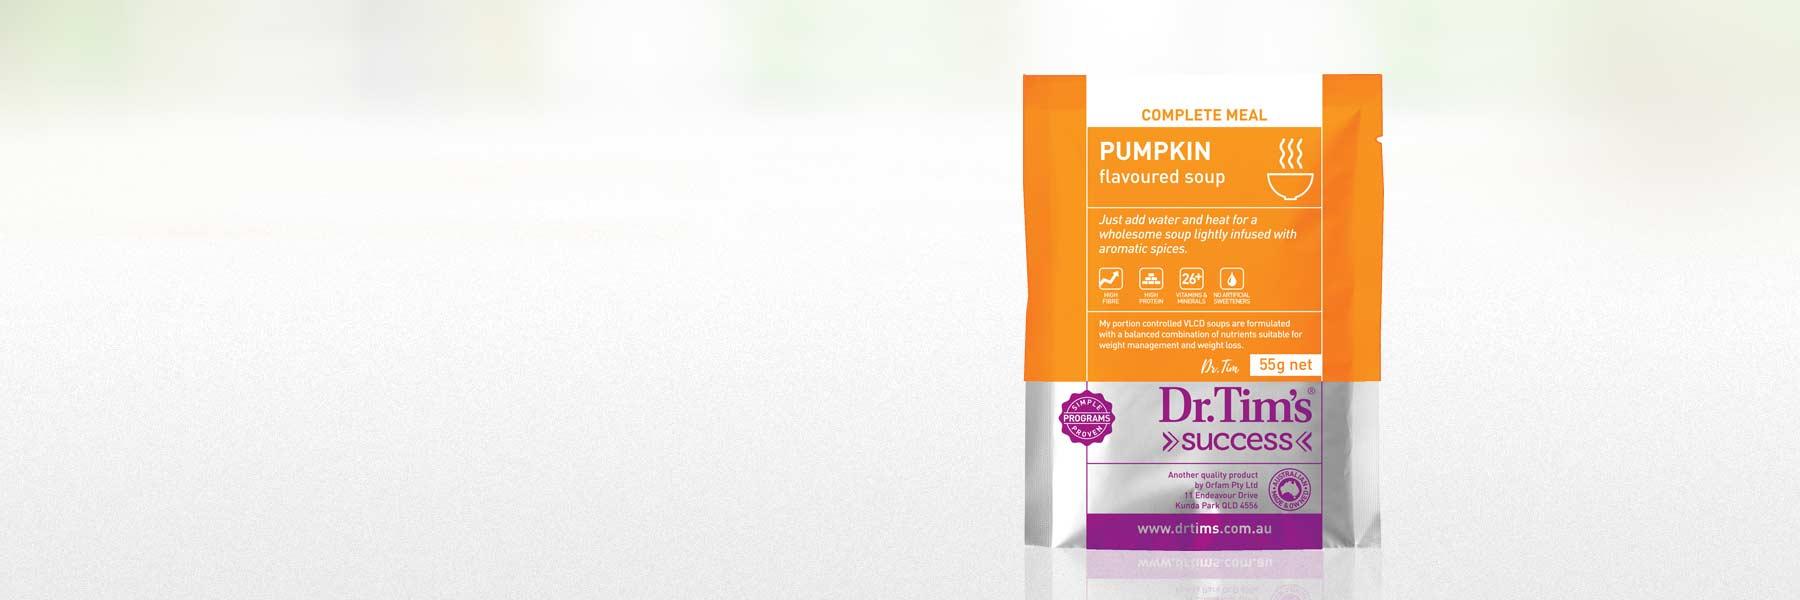 DrTims-Soup-Sachets-Pumpkin-2-hero